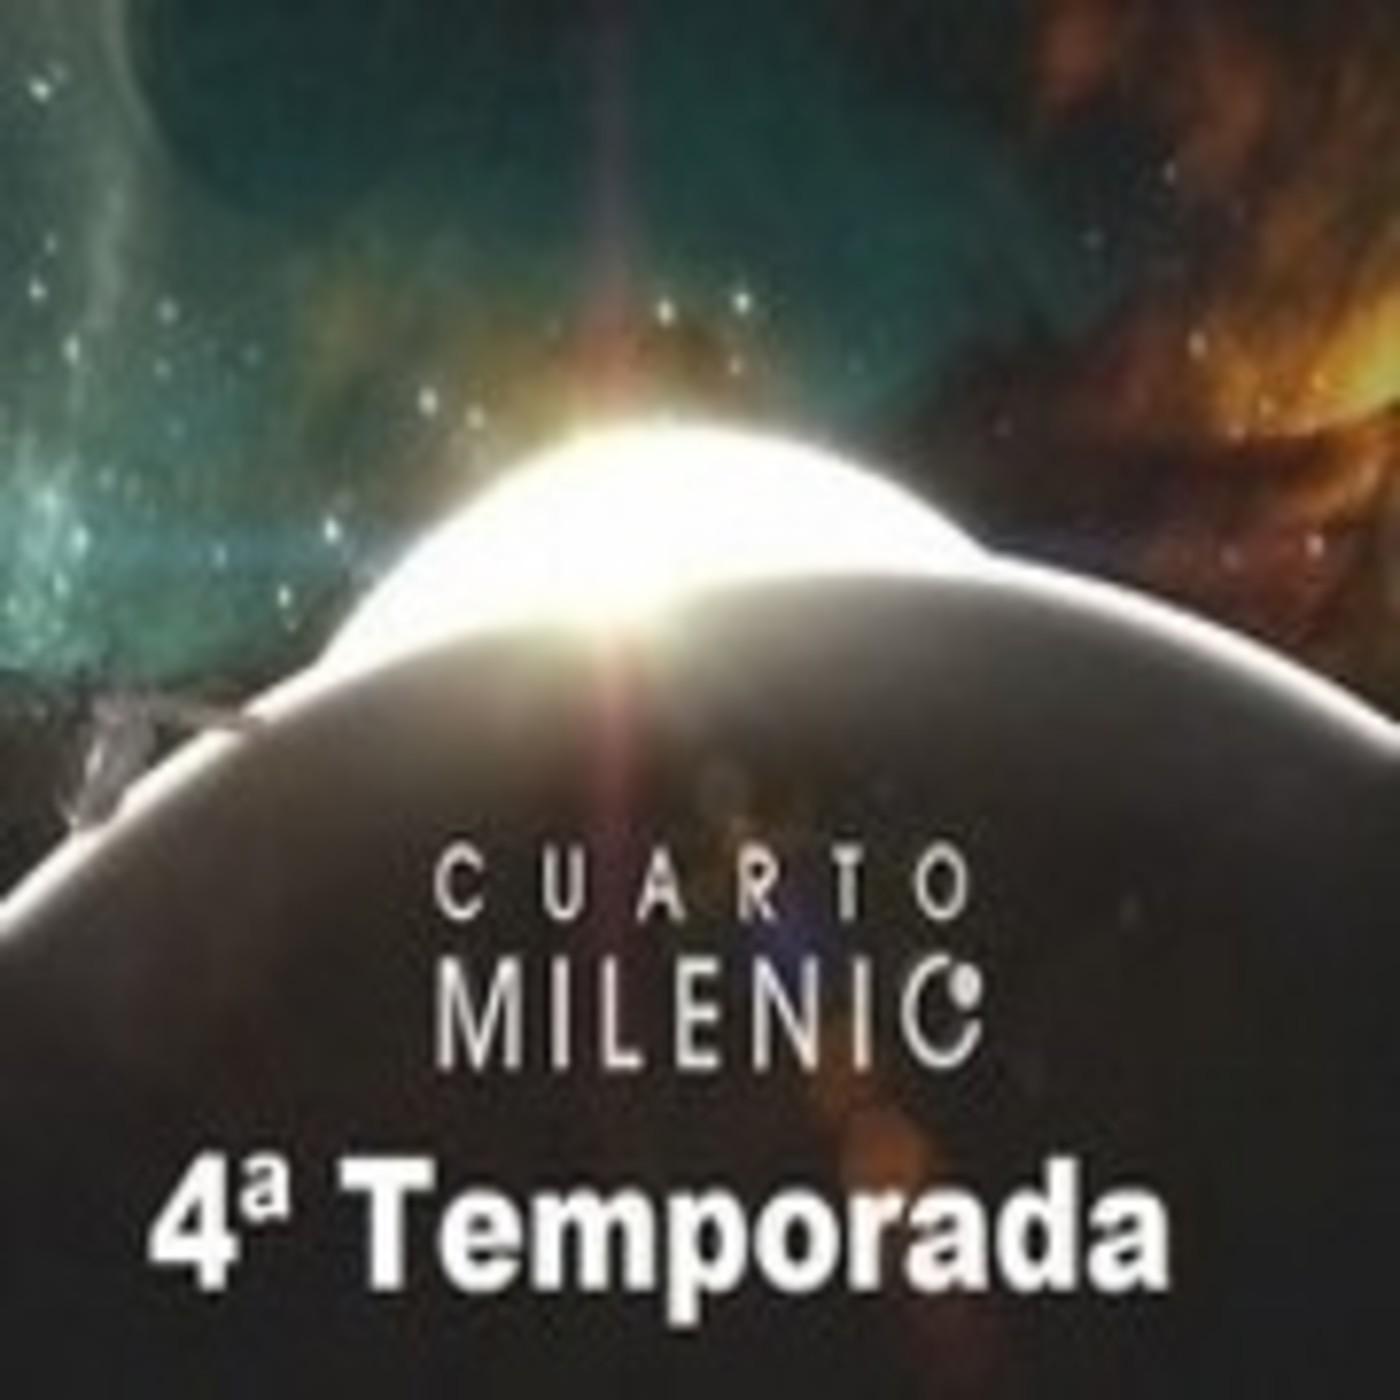 Cuarto milenio temporada 4 programa 40 imago mortis for Episodios cuarto milenio